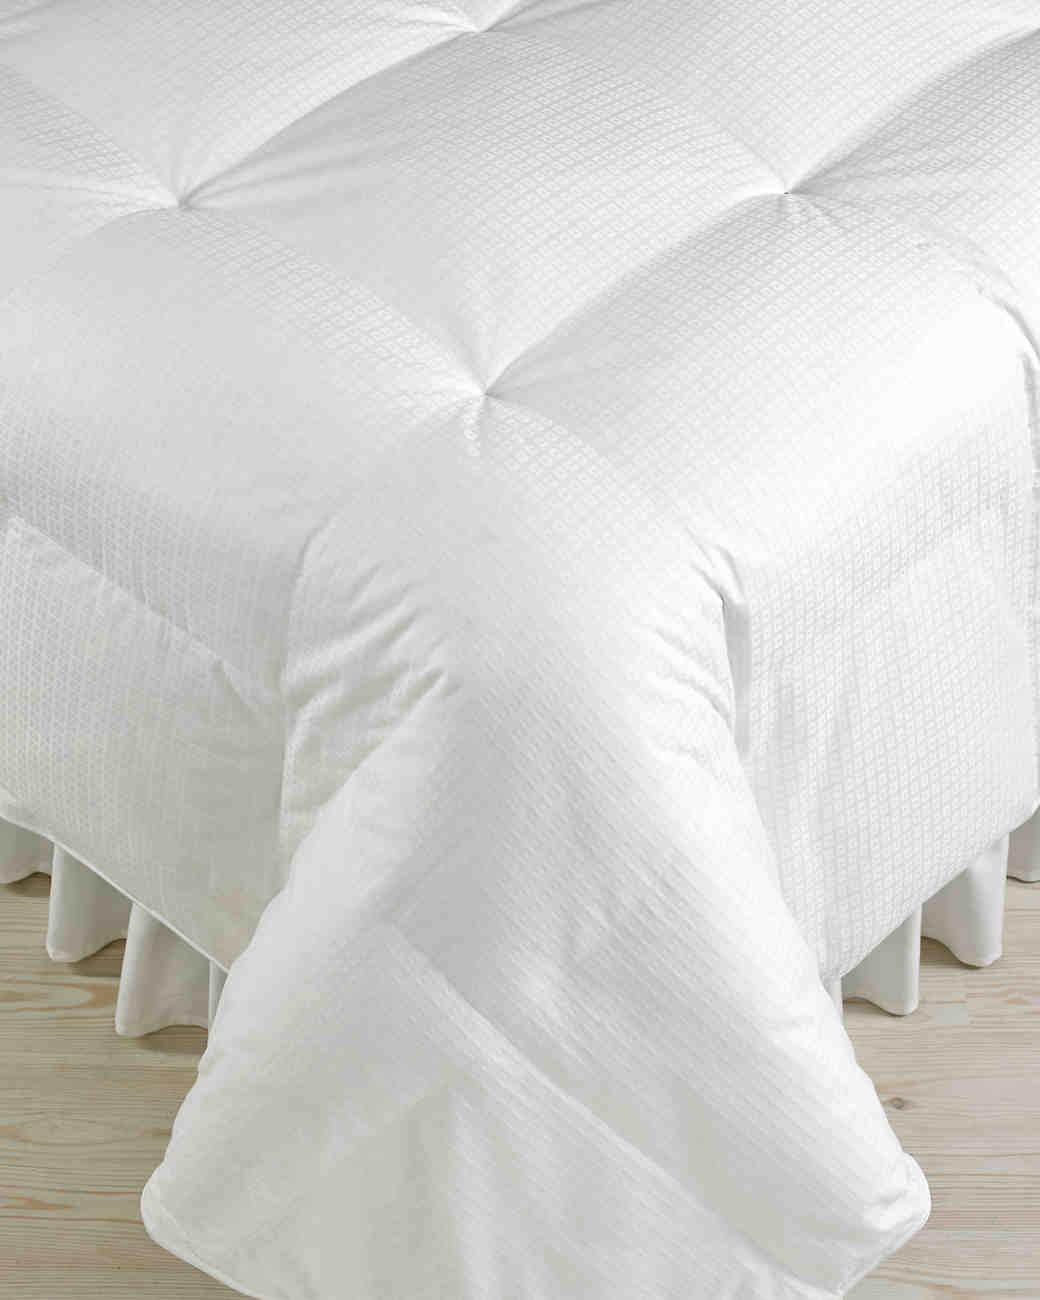 macys-registry-3-hotel-collection-lightweight-down-comforter-0115.jpg